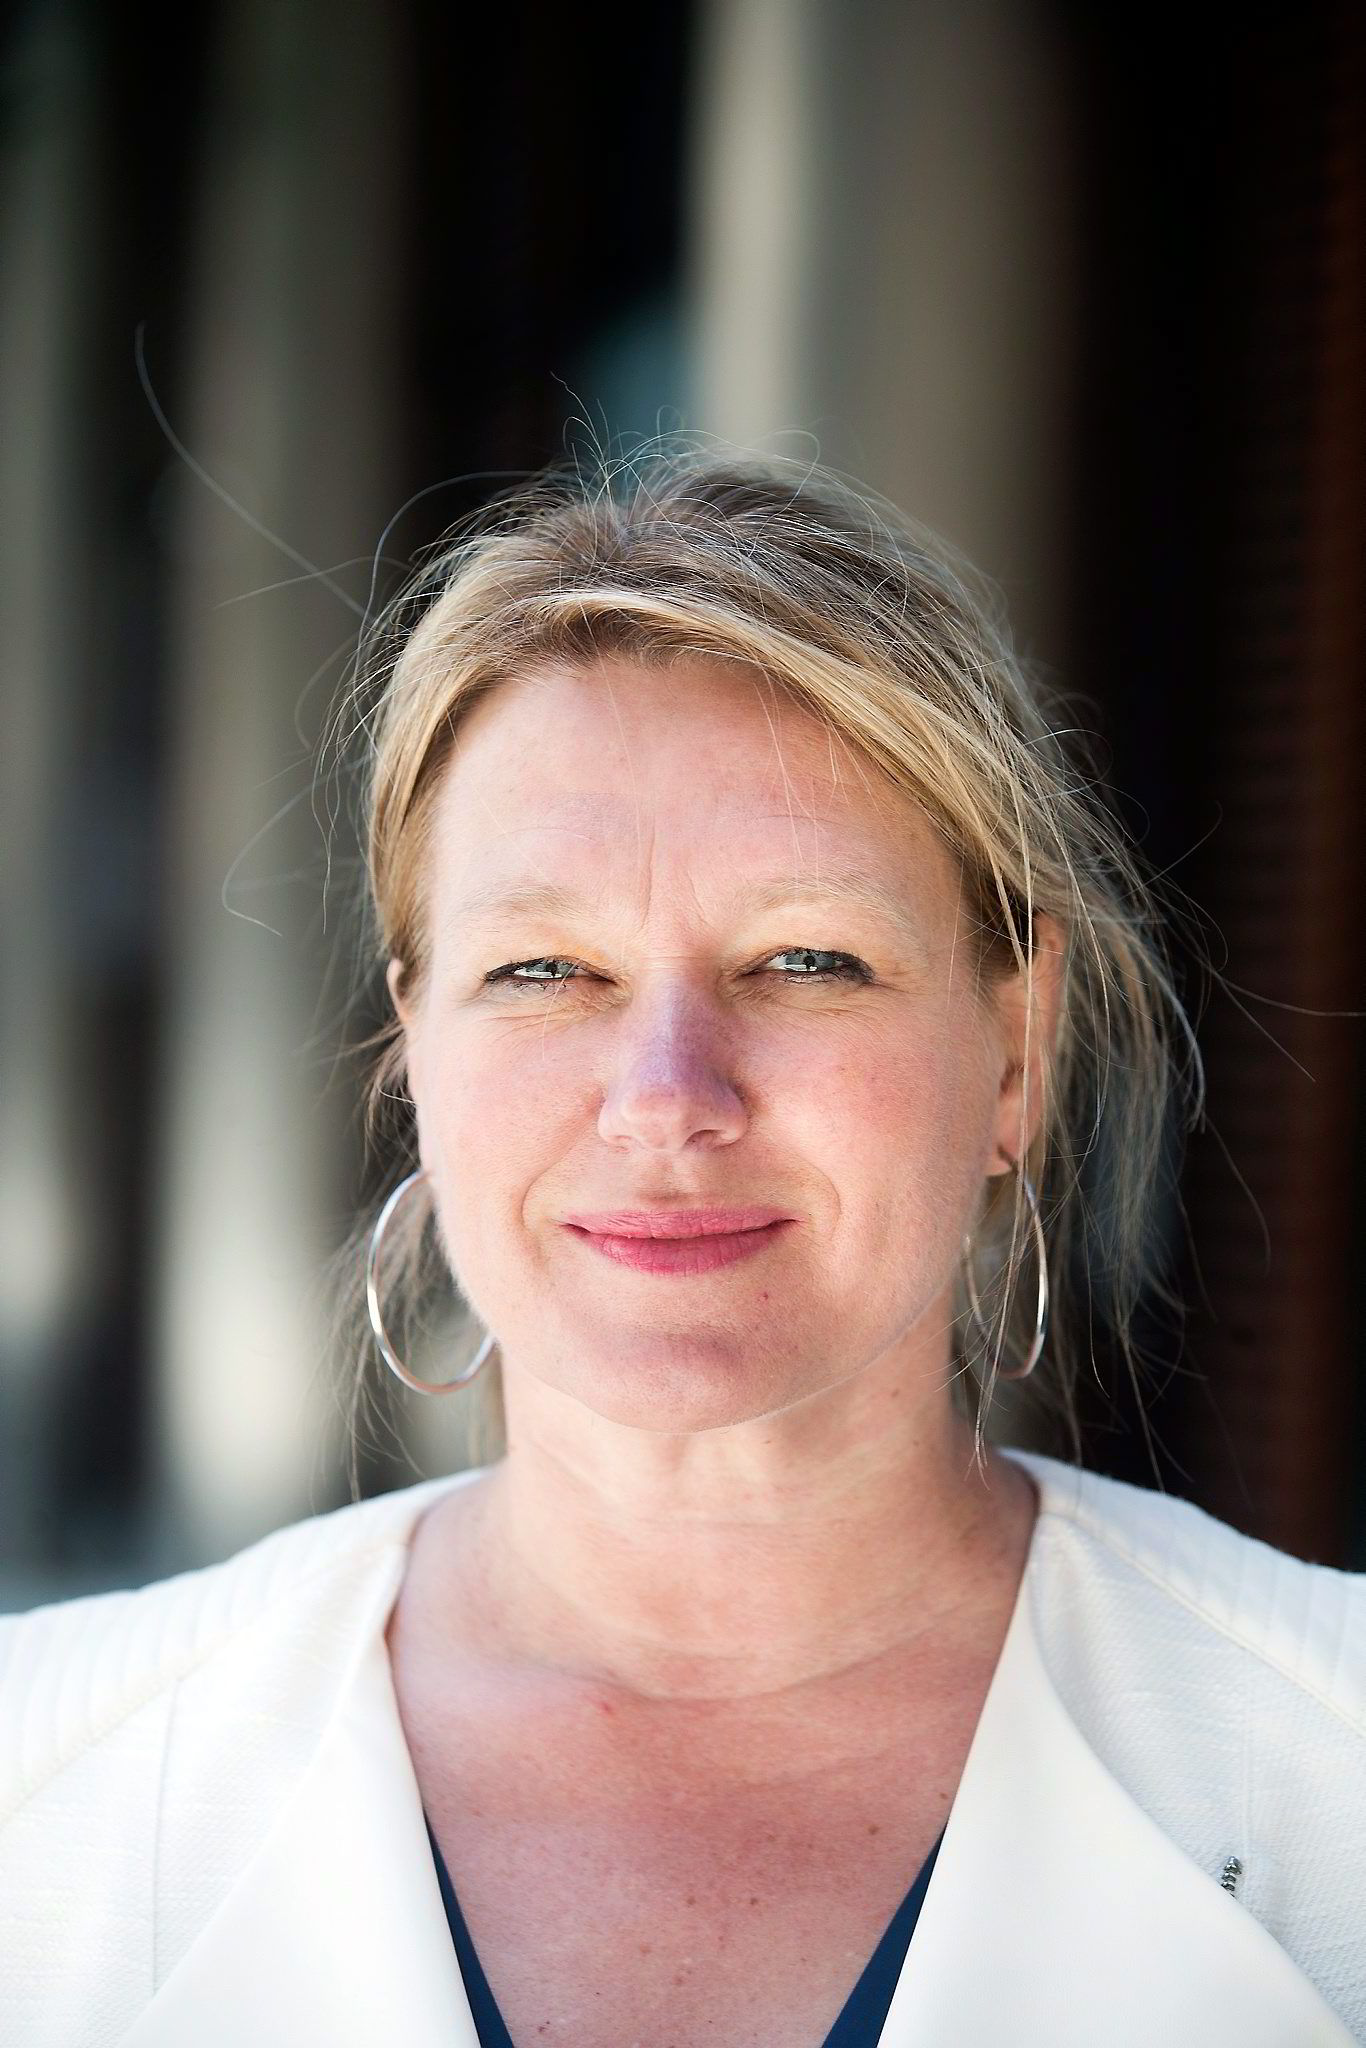 Førstestatsadvokat Marianne Djupesland i Økokrim. Foto: Fredrik Solstad